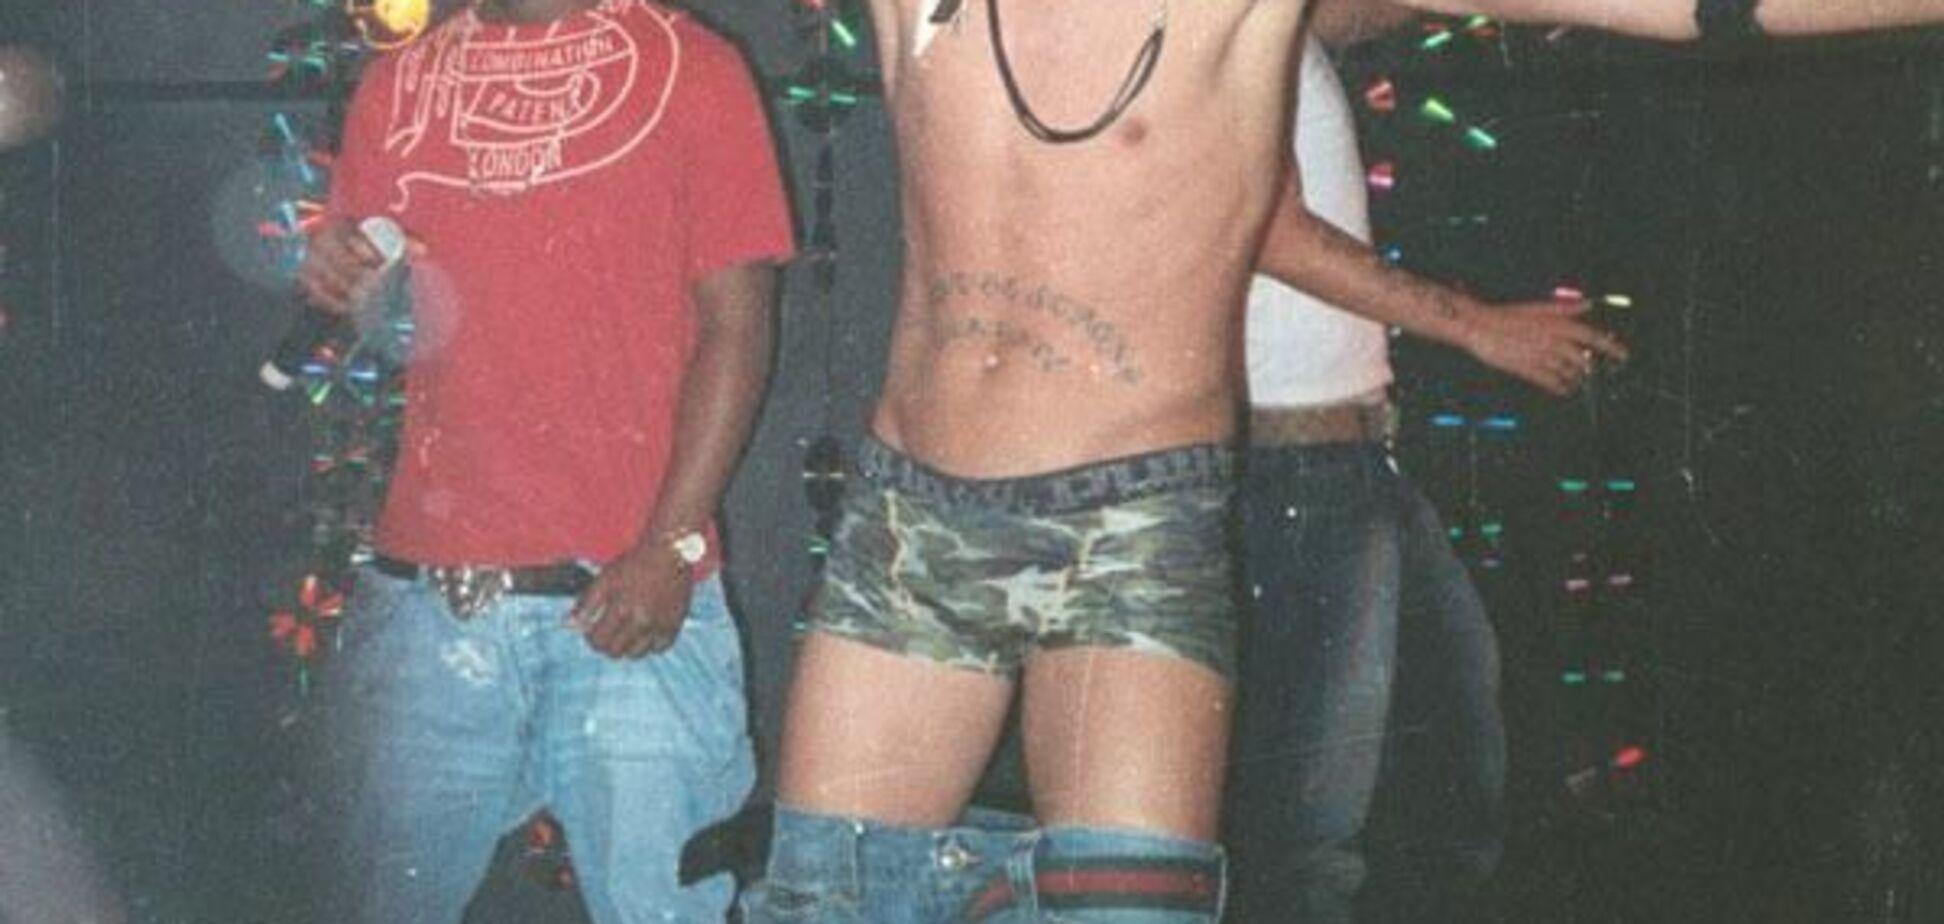 Вопрос дня: Почему Тимати без штанов?